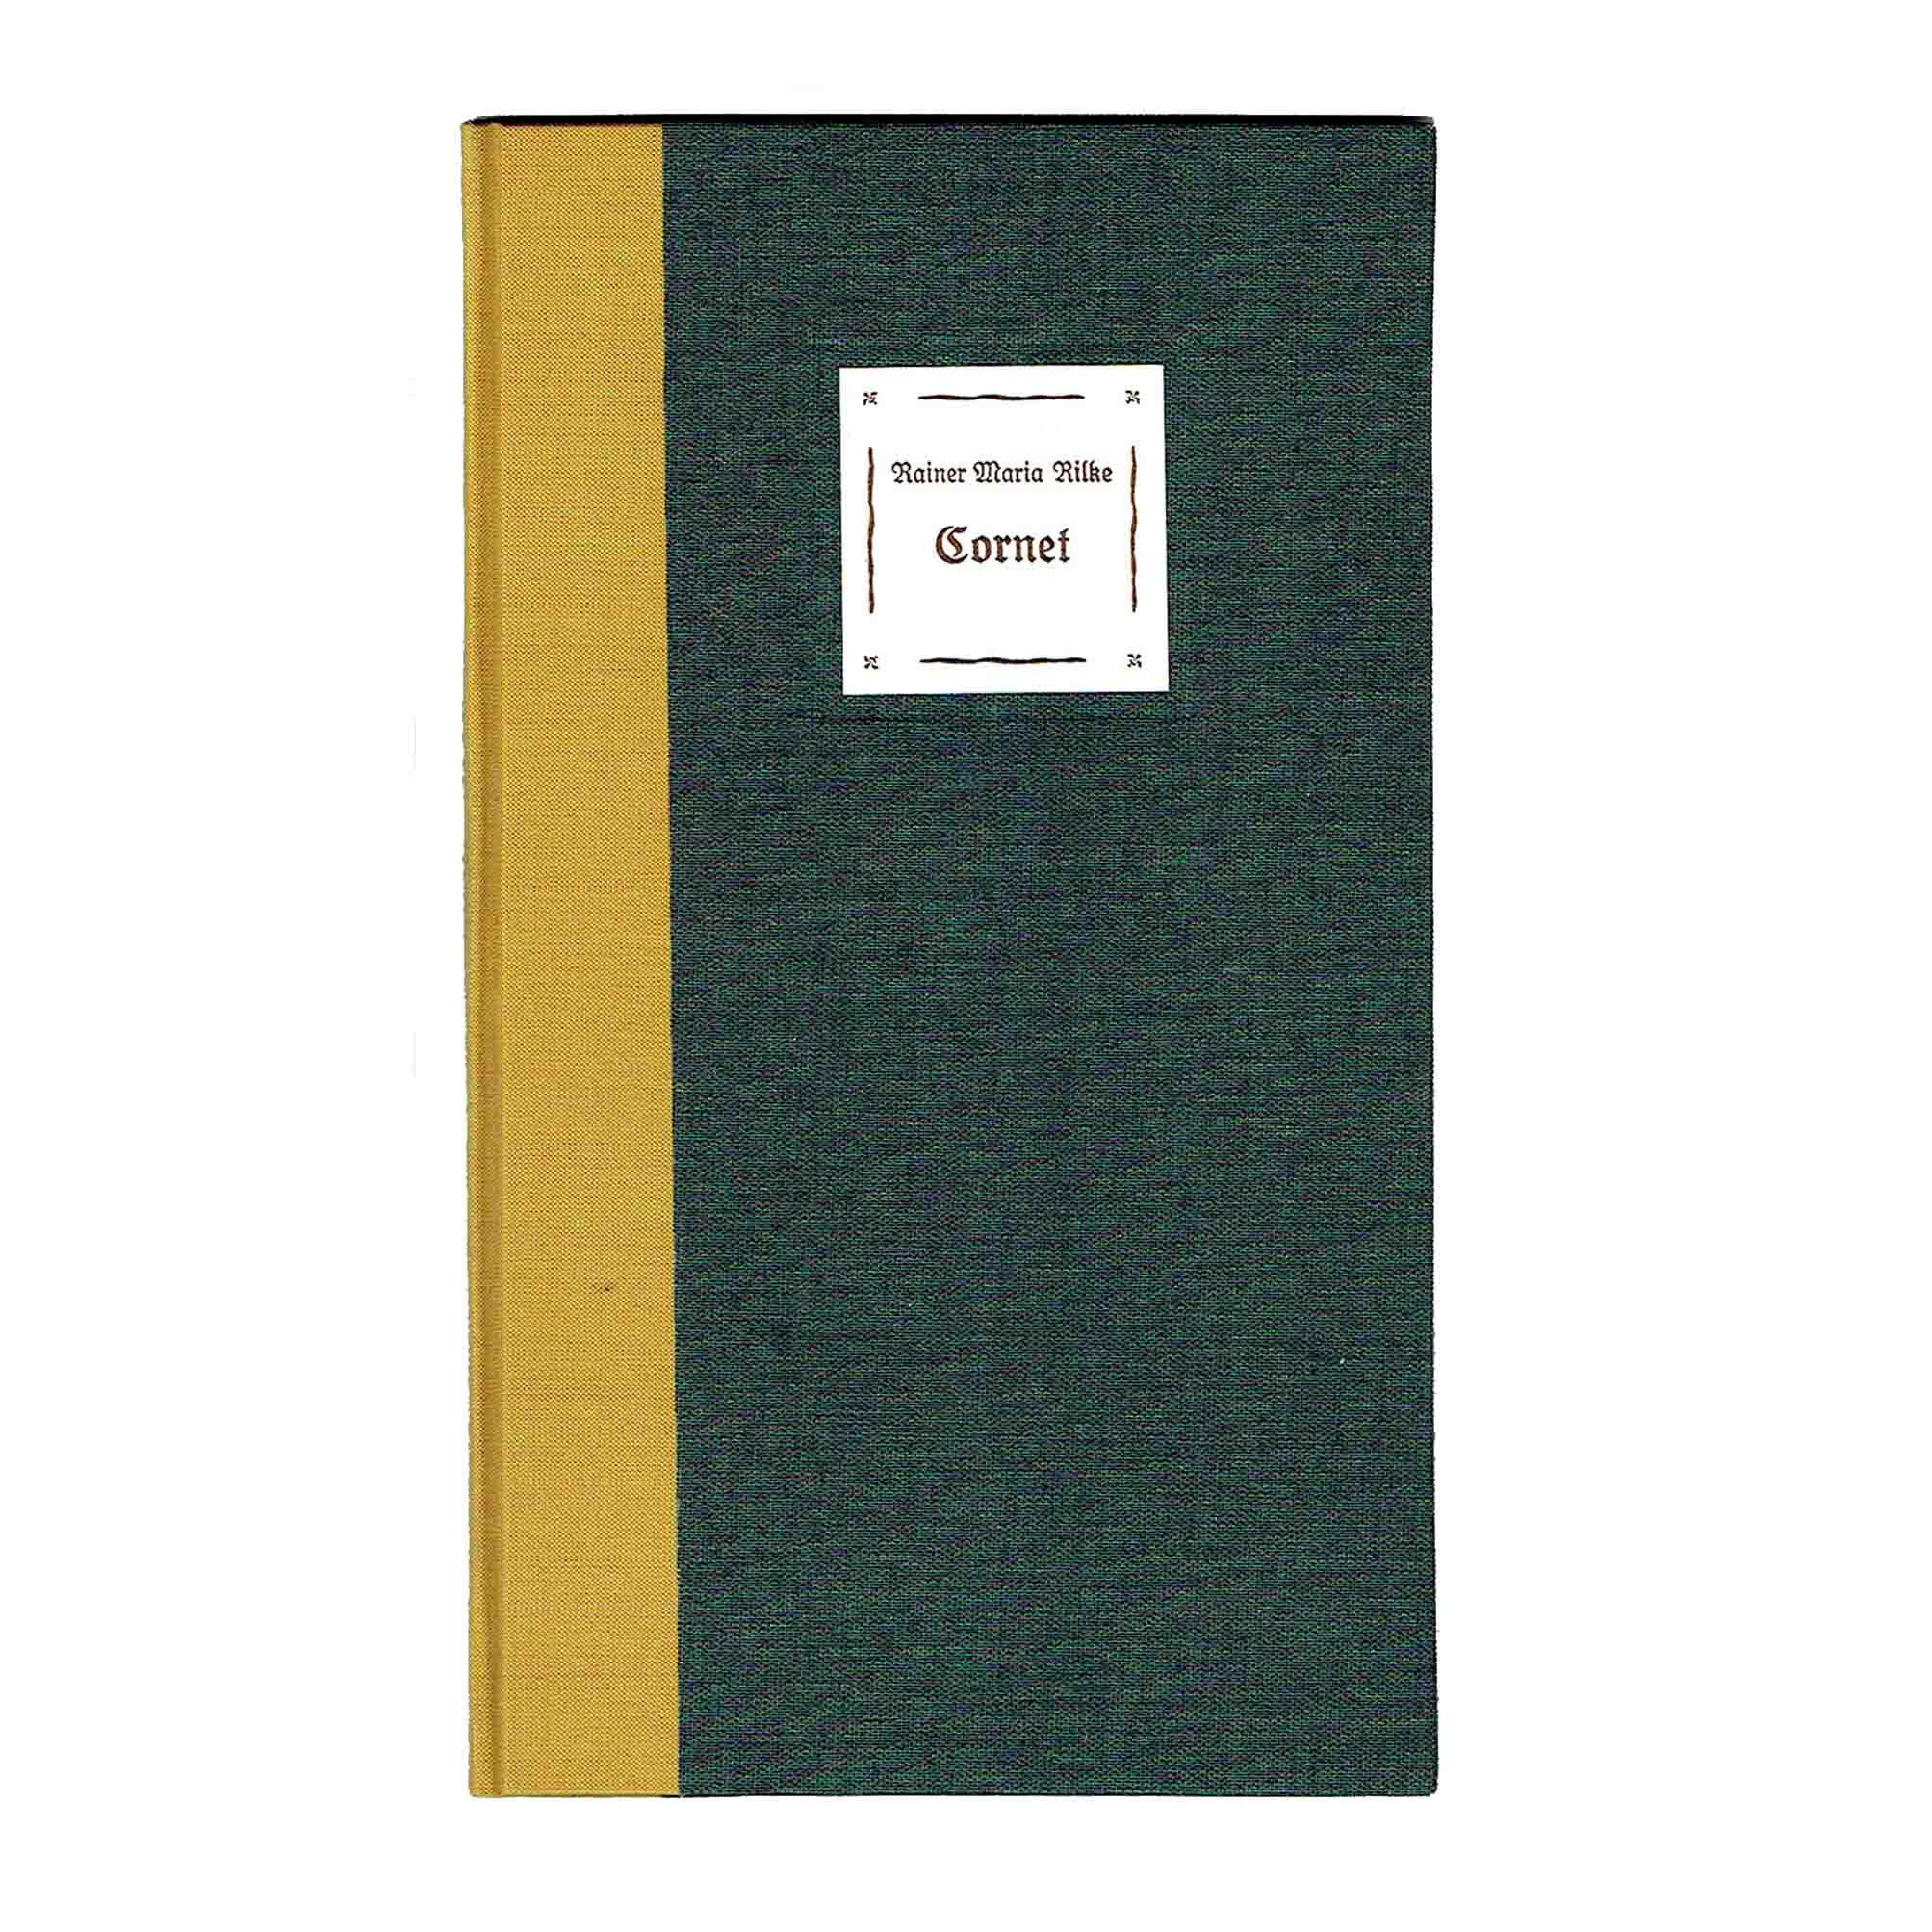 5960-Rilke-Kuhn-Cornet-Num-Sign-Burgenland-1988-Einband-frei-N.jpeg